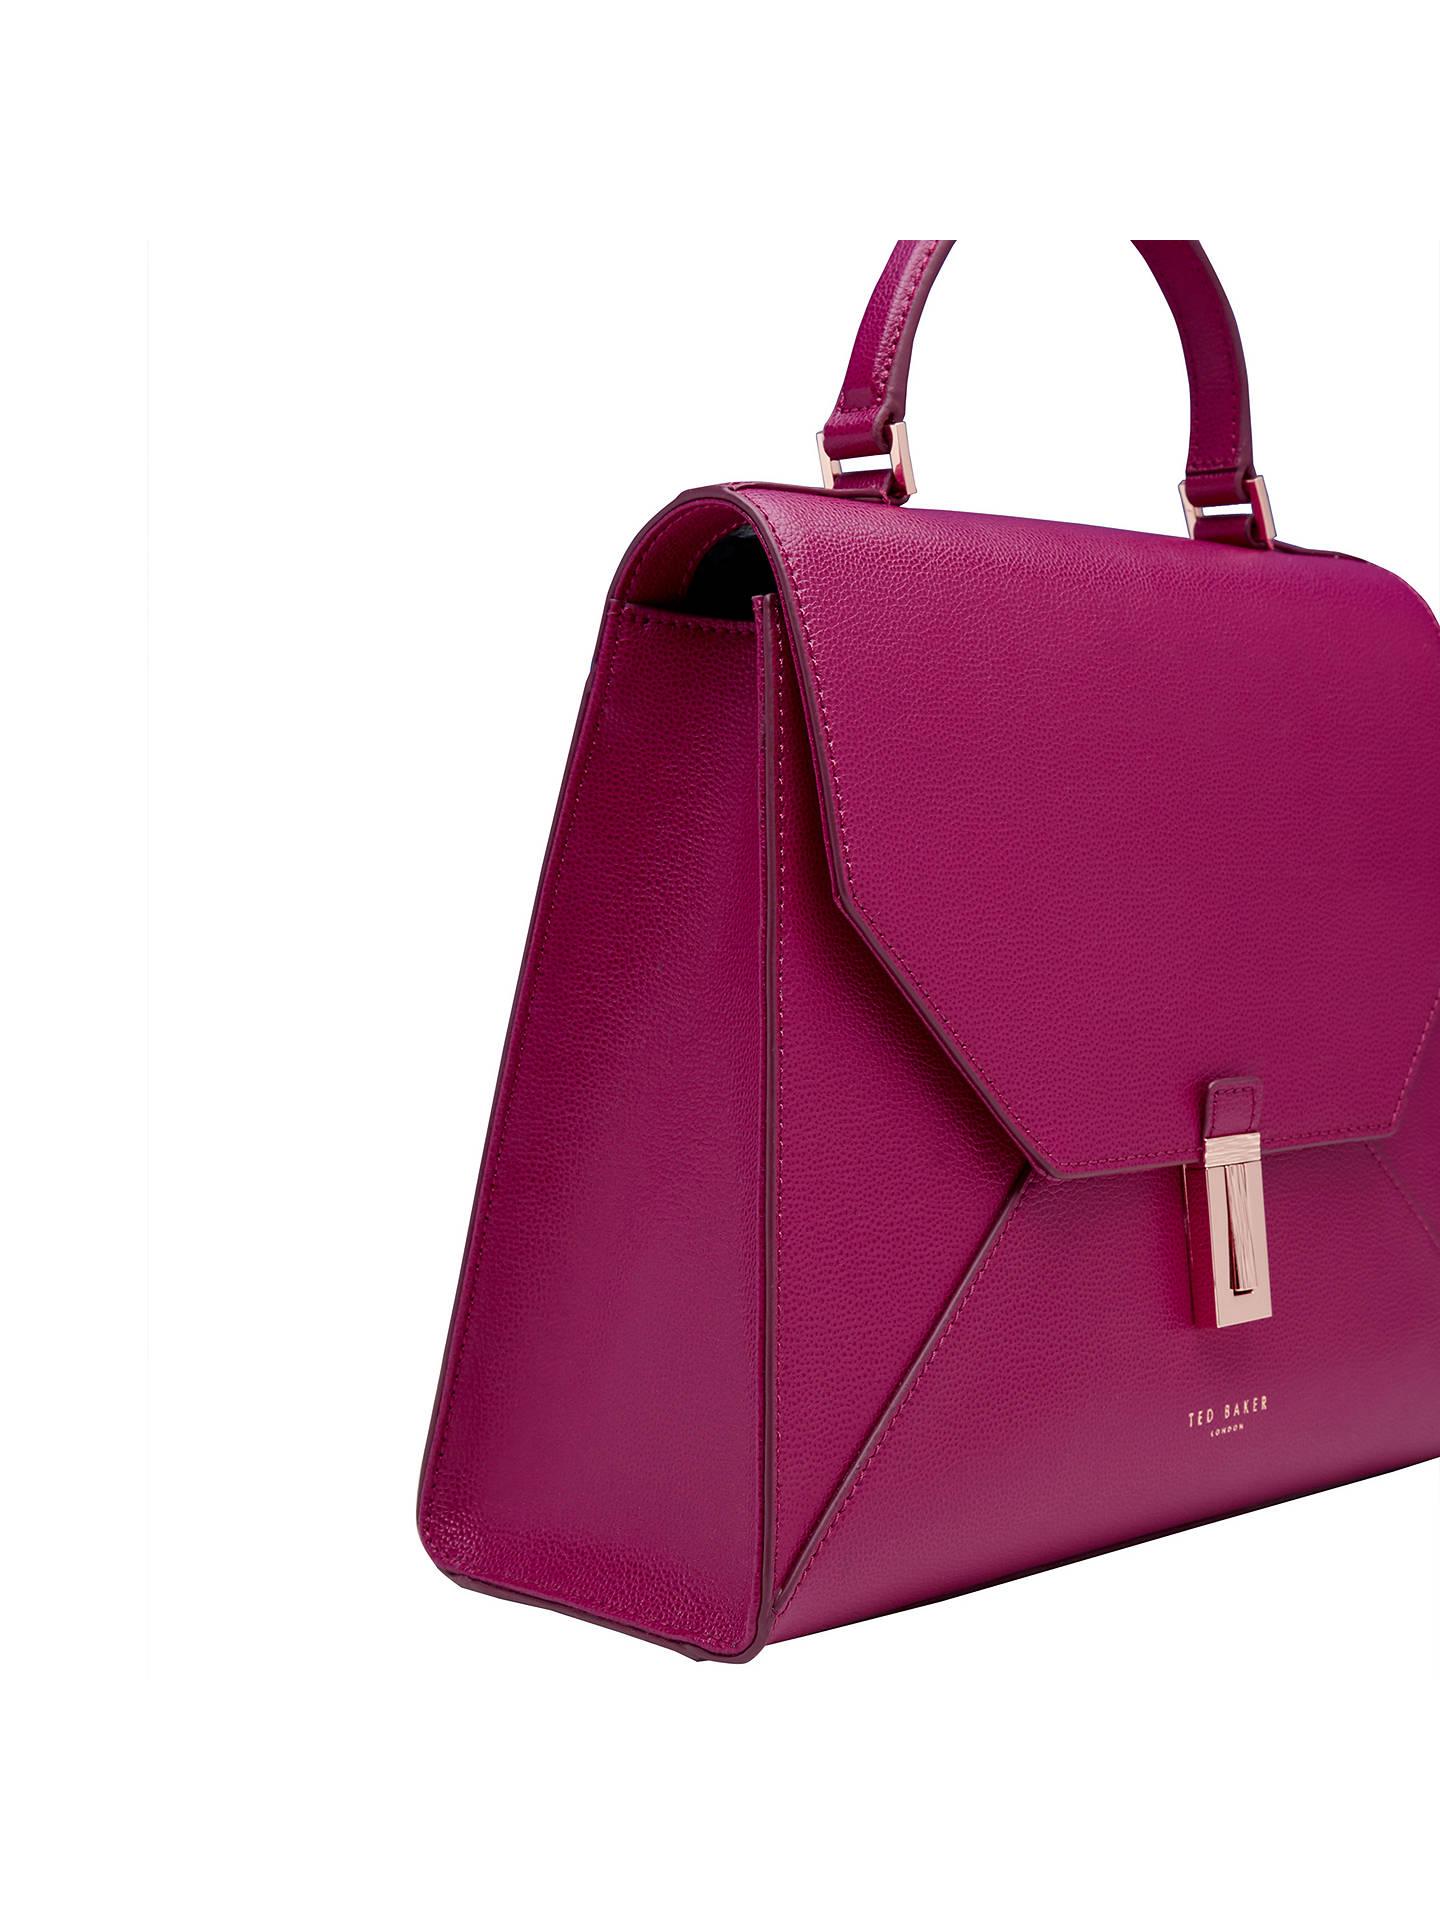 45c0cc58069 ... Buy Ted Baker Ellice Leather Top Handle Grab Bag, Grape Online at  johnlewis.com